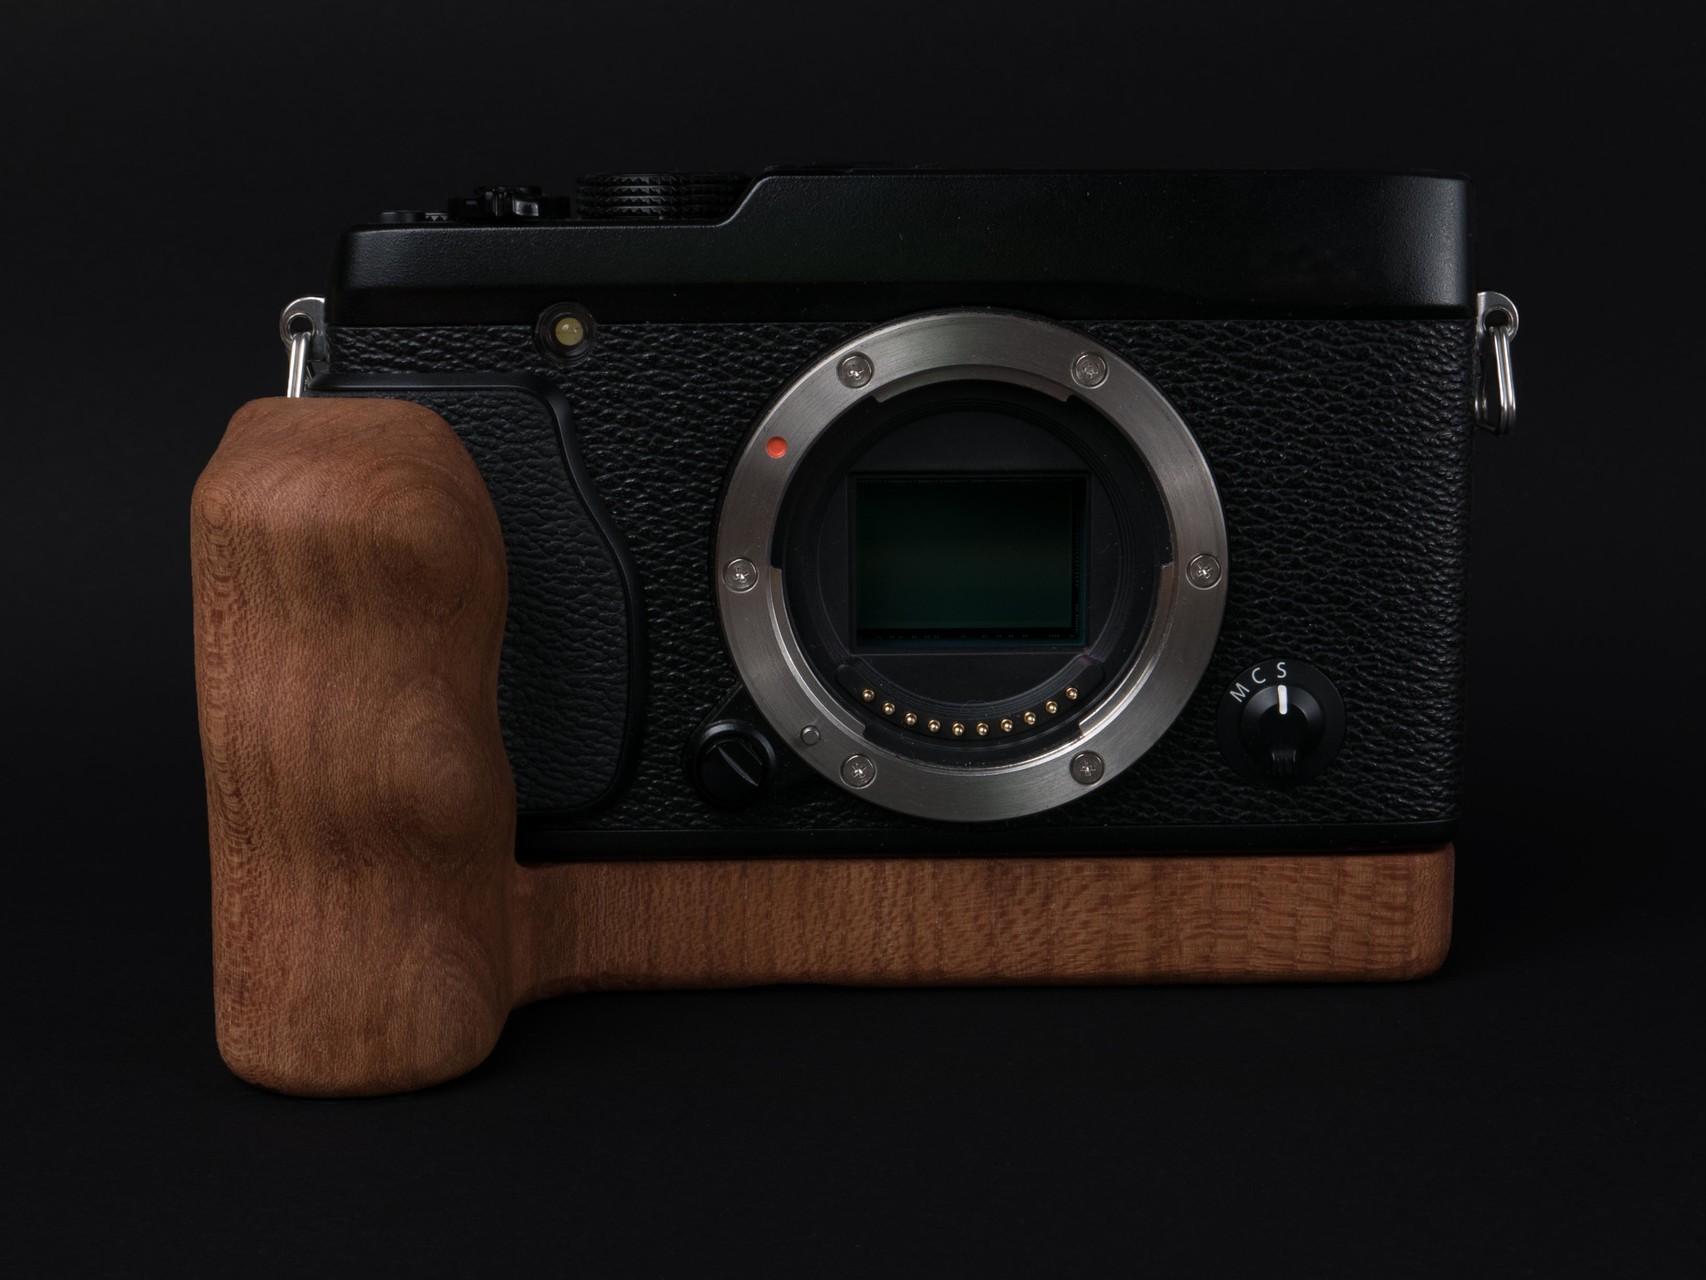 Fujifilm X-E1 mit Holzgriff